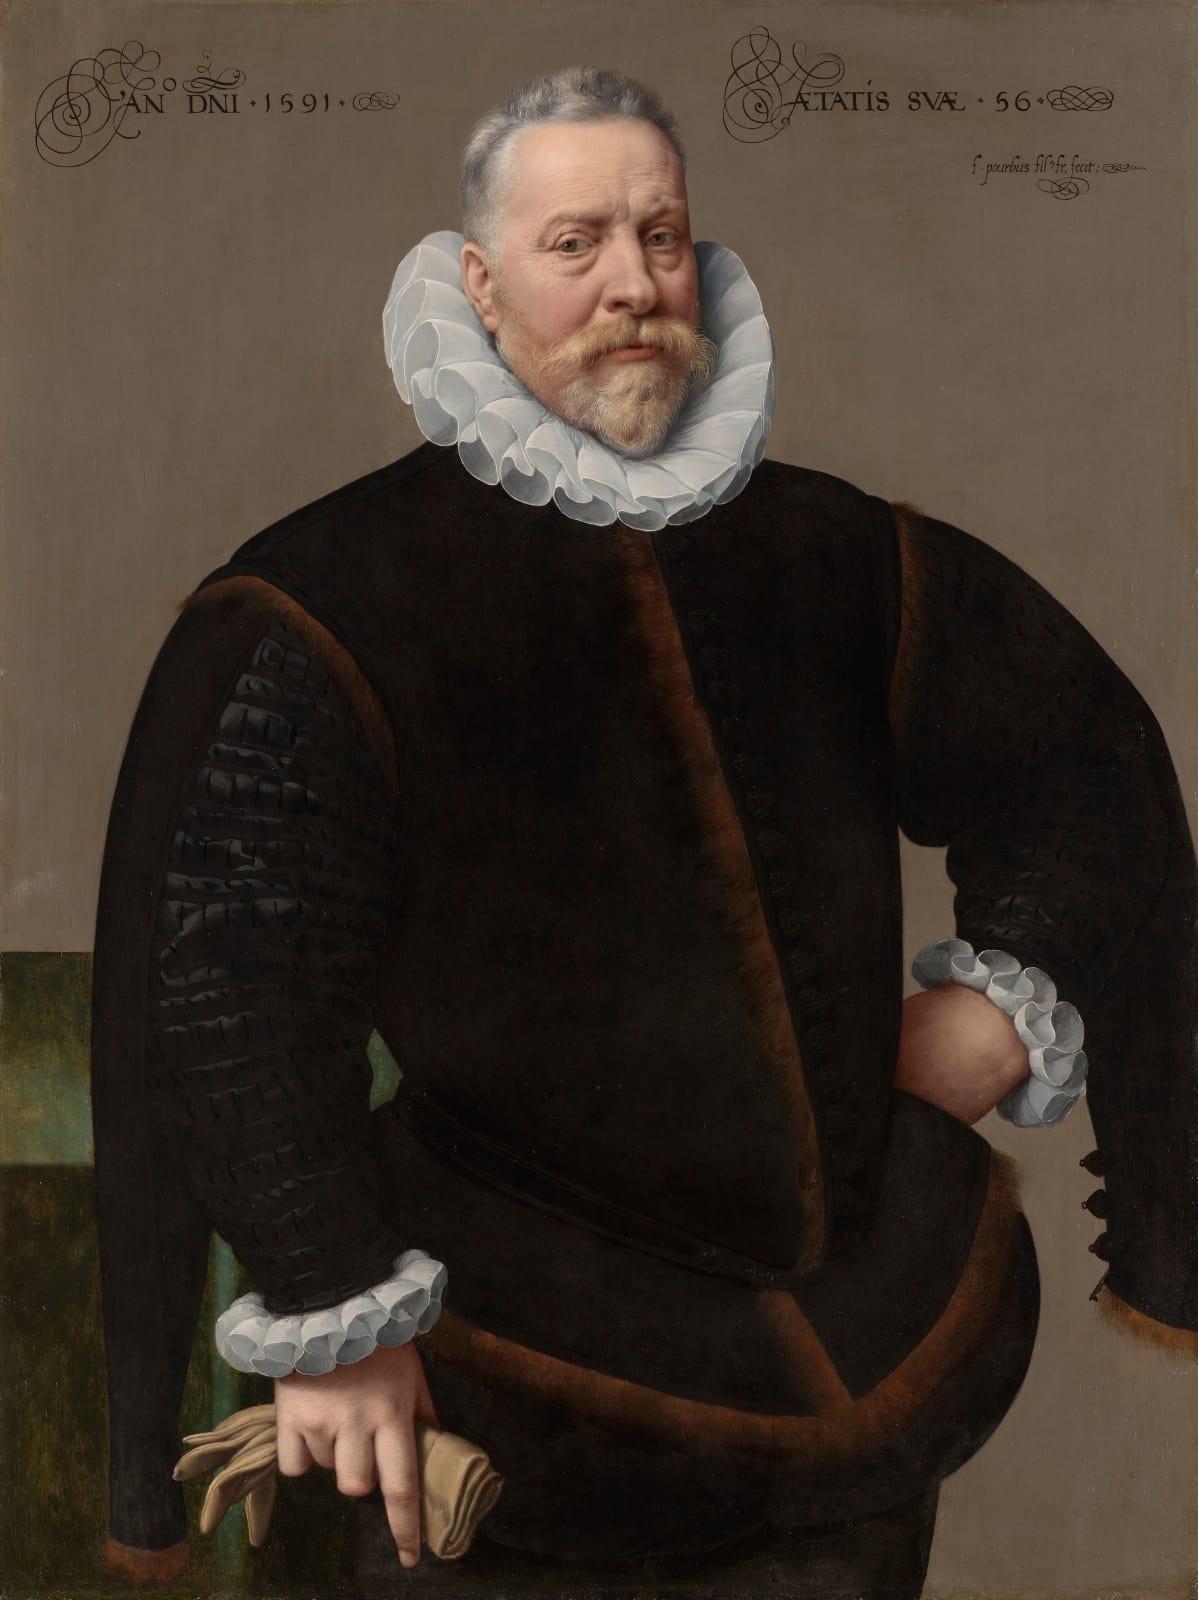 An Unknown Man, aged 56